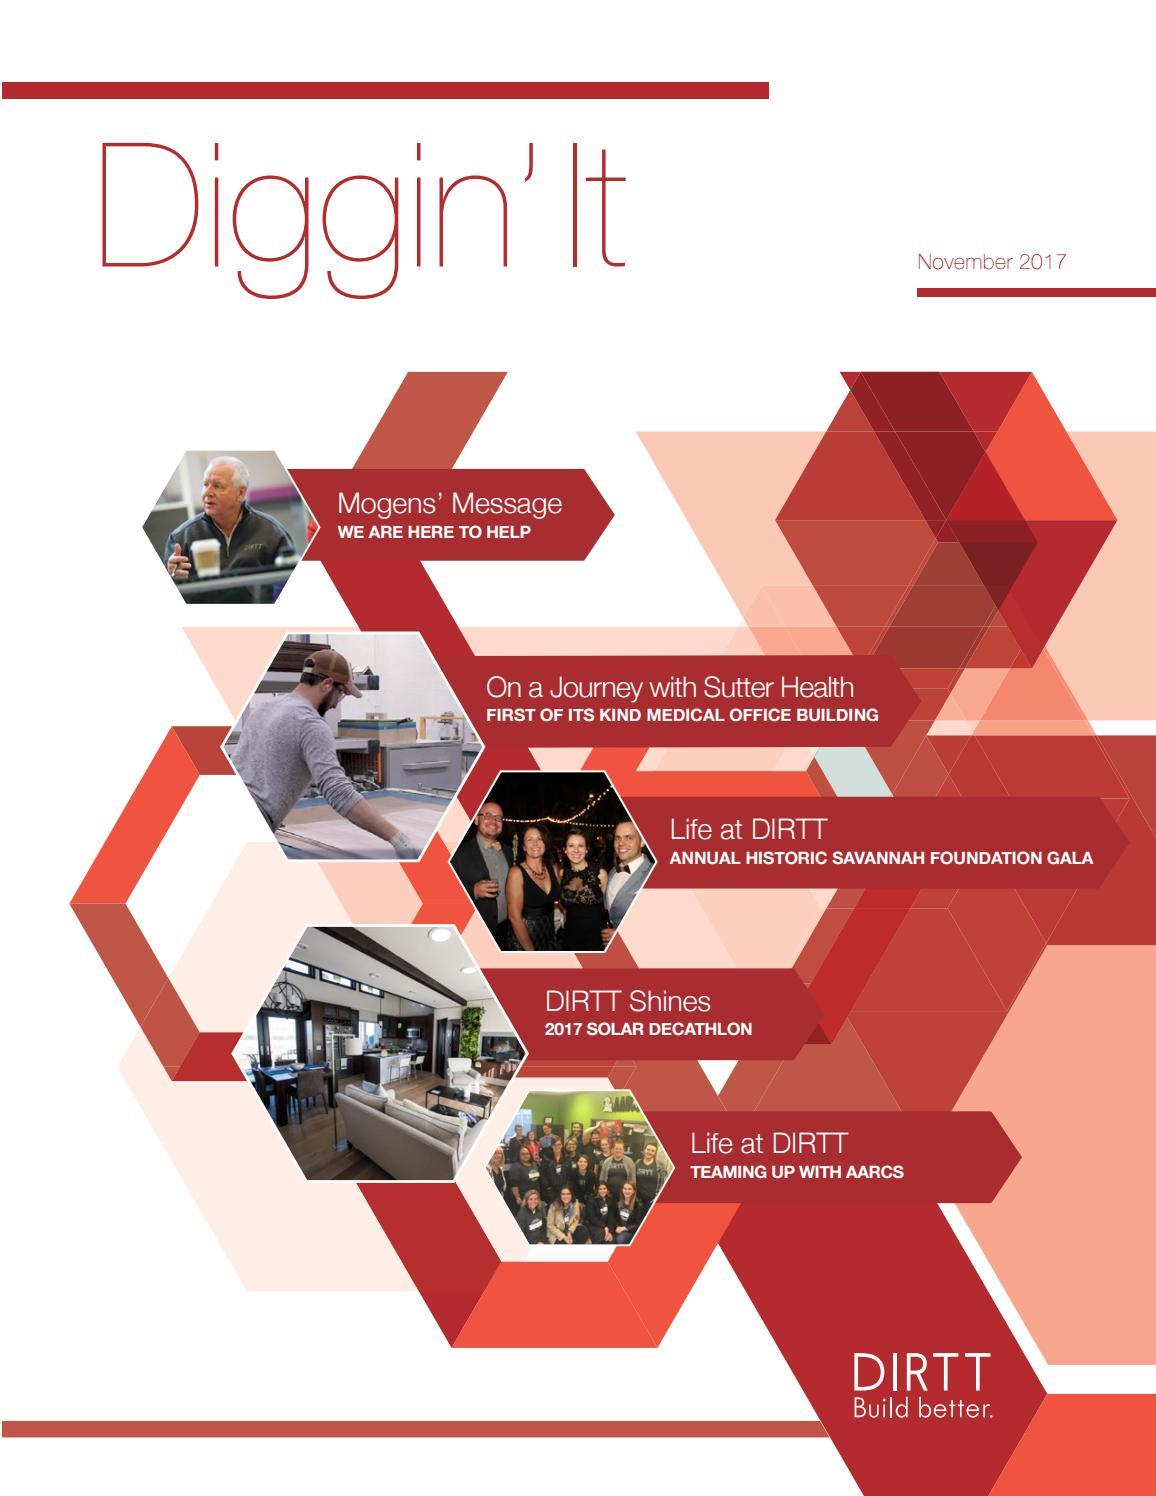 Diggin' It | November 2017 by DIRTT - issuu